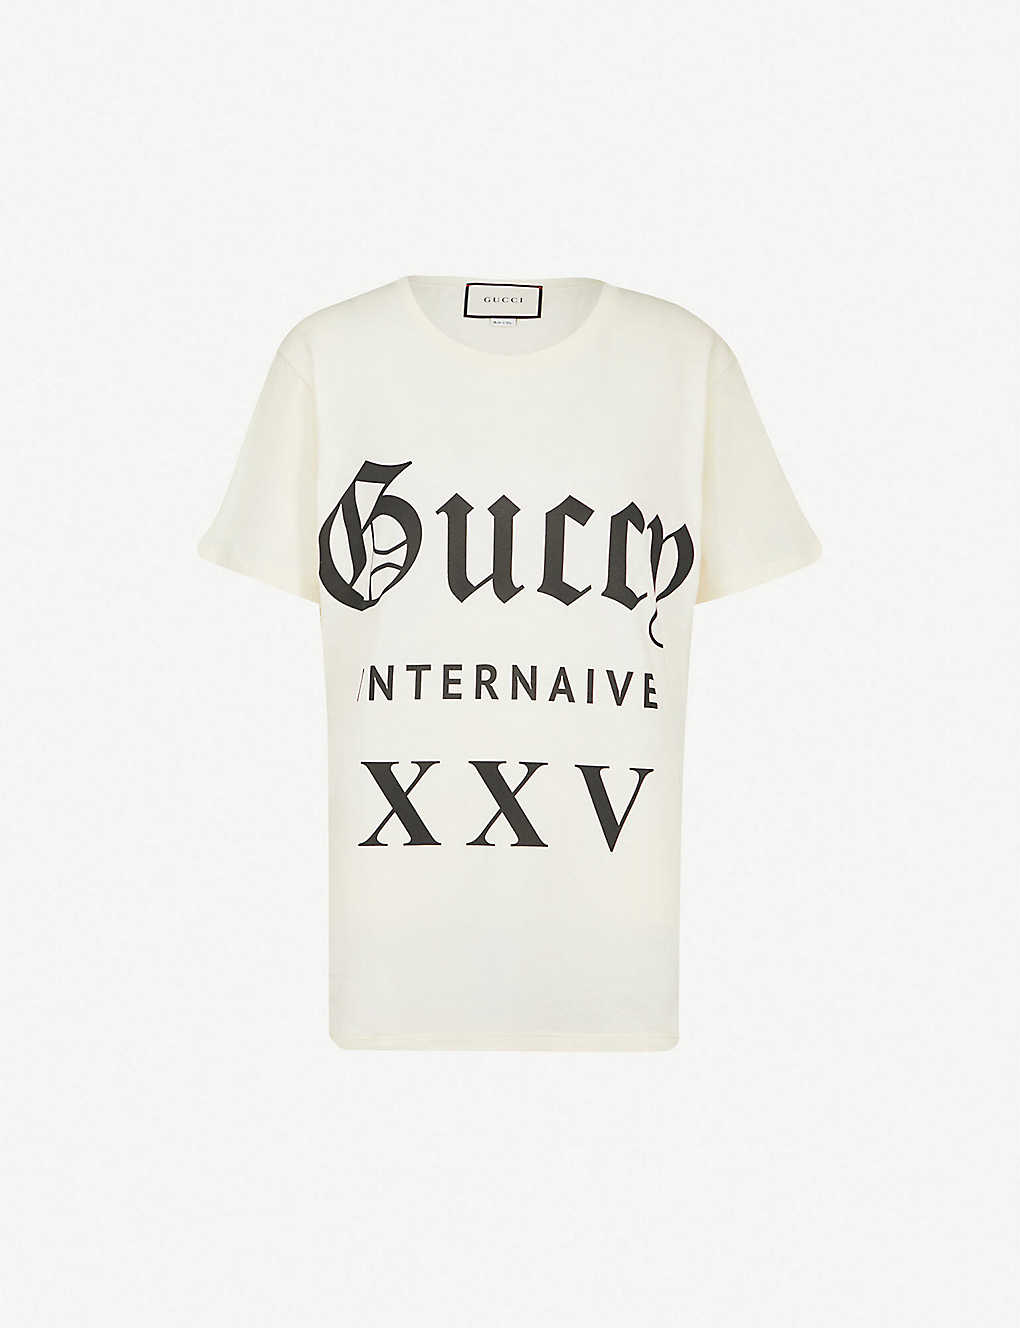 e5dcac92 GUCCI - Guccy Internaive XXV cotton-jersey T-shirt | Selfridges.com